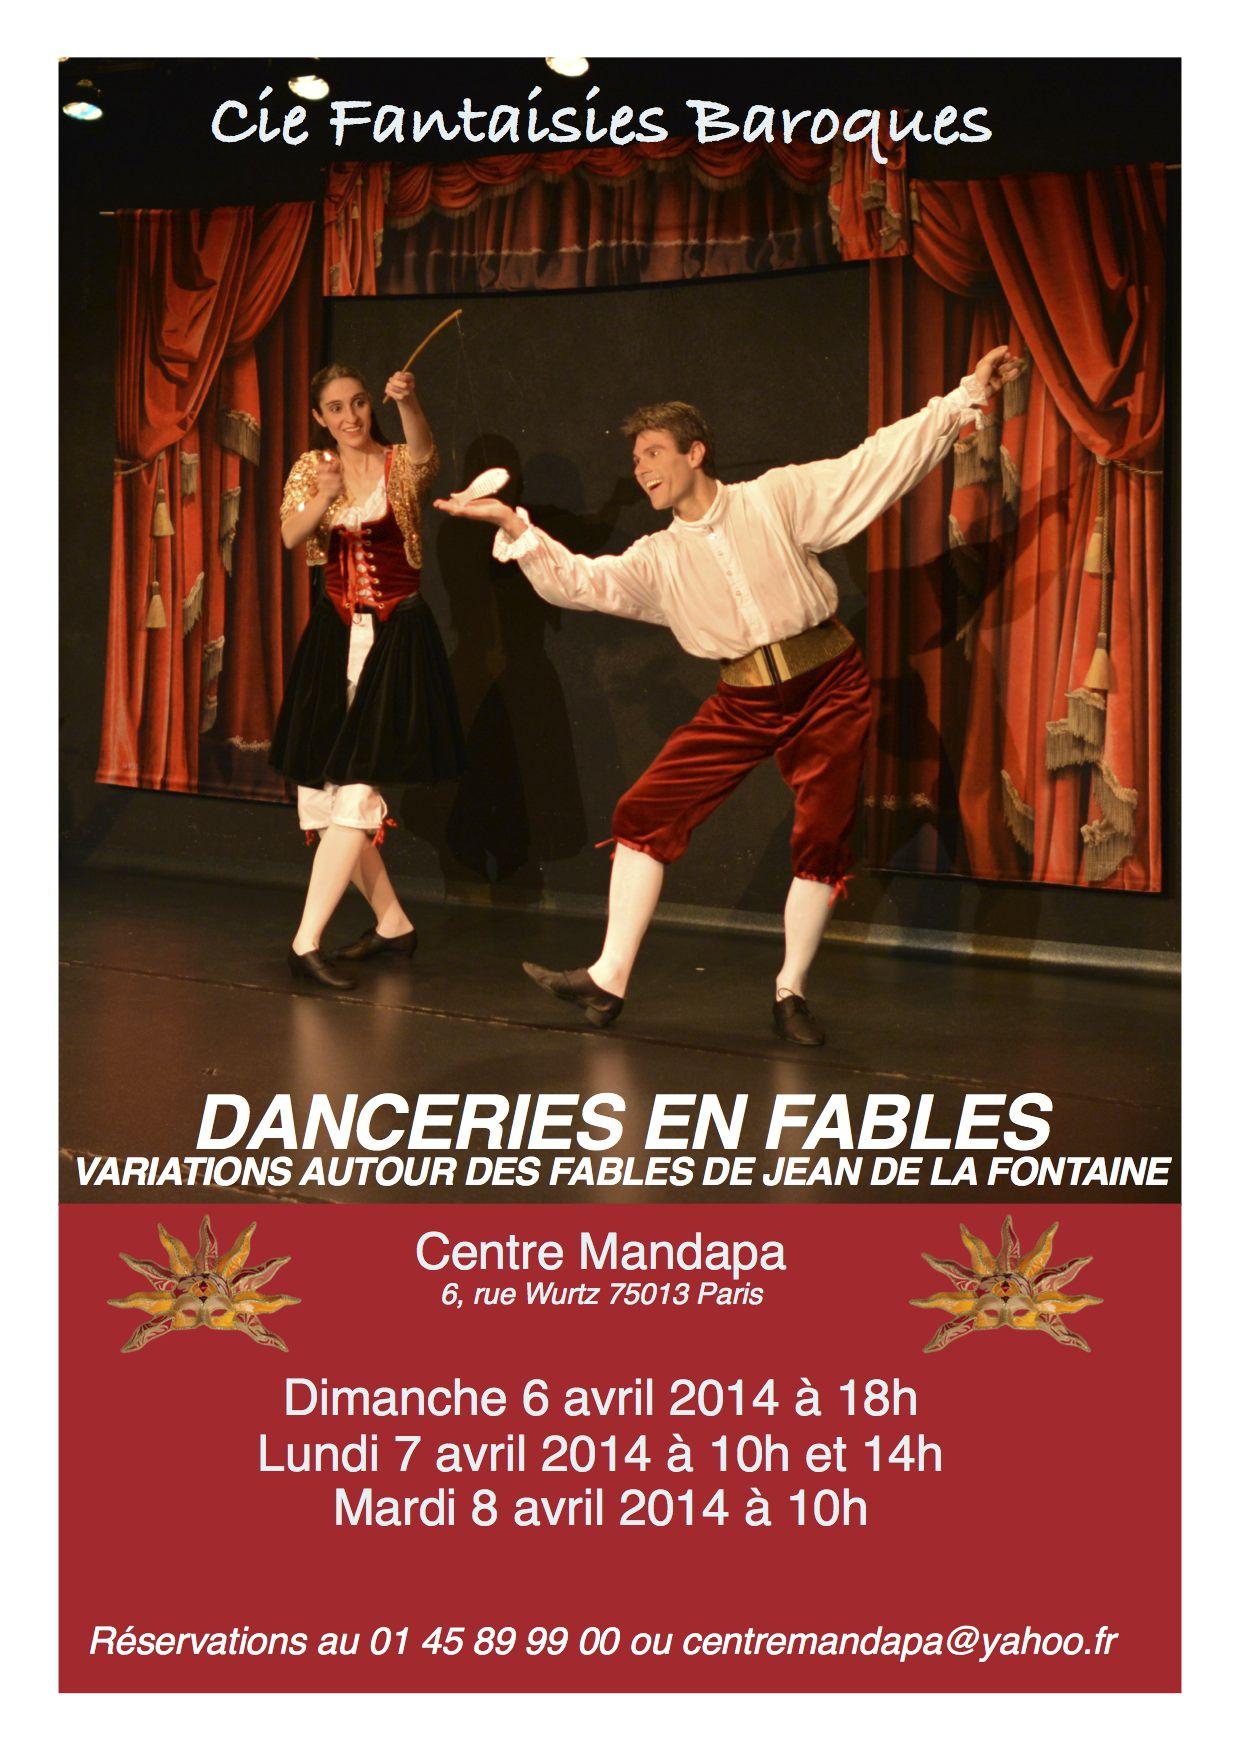 Affiche La Fontaine-Mandapa 2014